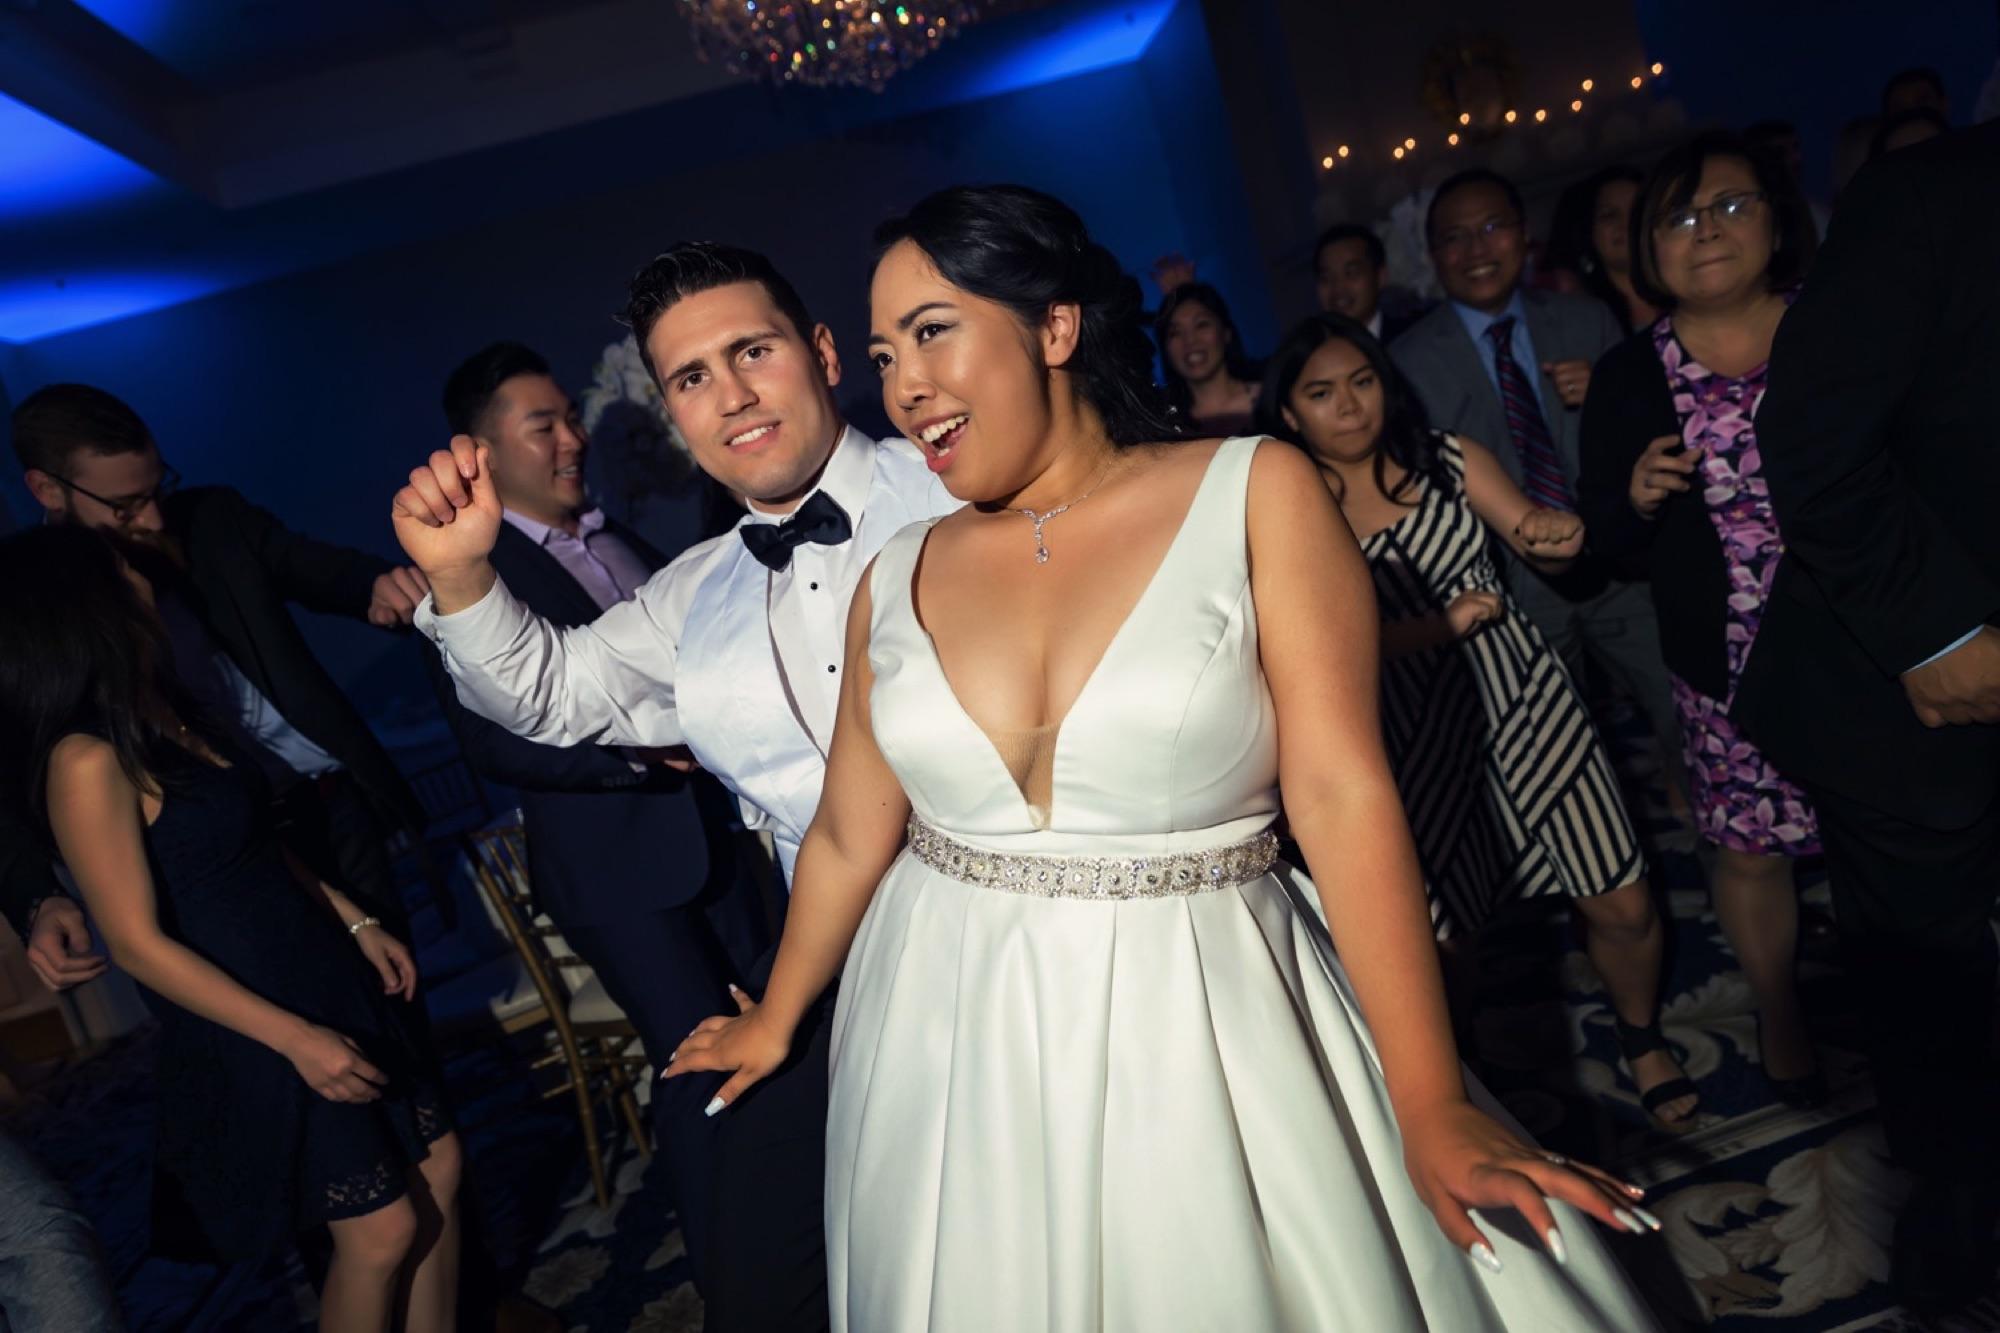 Trump National Golf Club Wedding Palos Verdes | Los Angeles Wedding Photographer, Michael Anthony Photography Blog: Los Angeles Wedding Photography